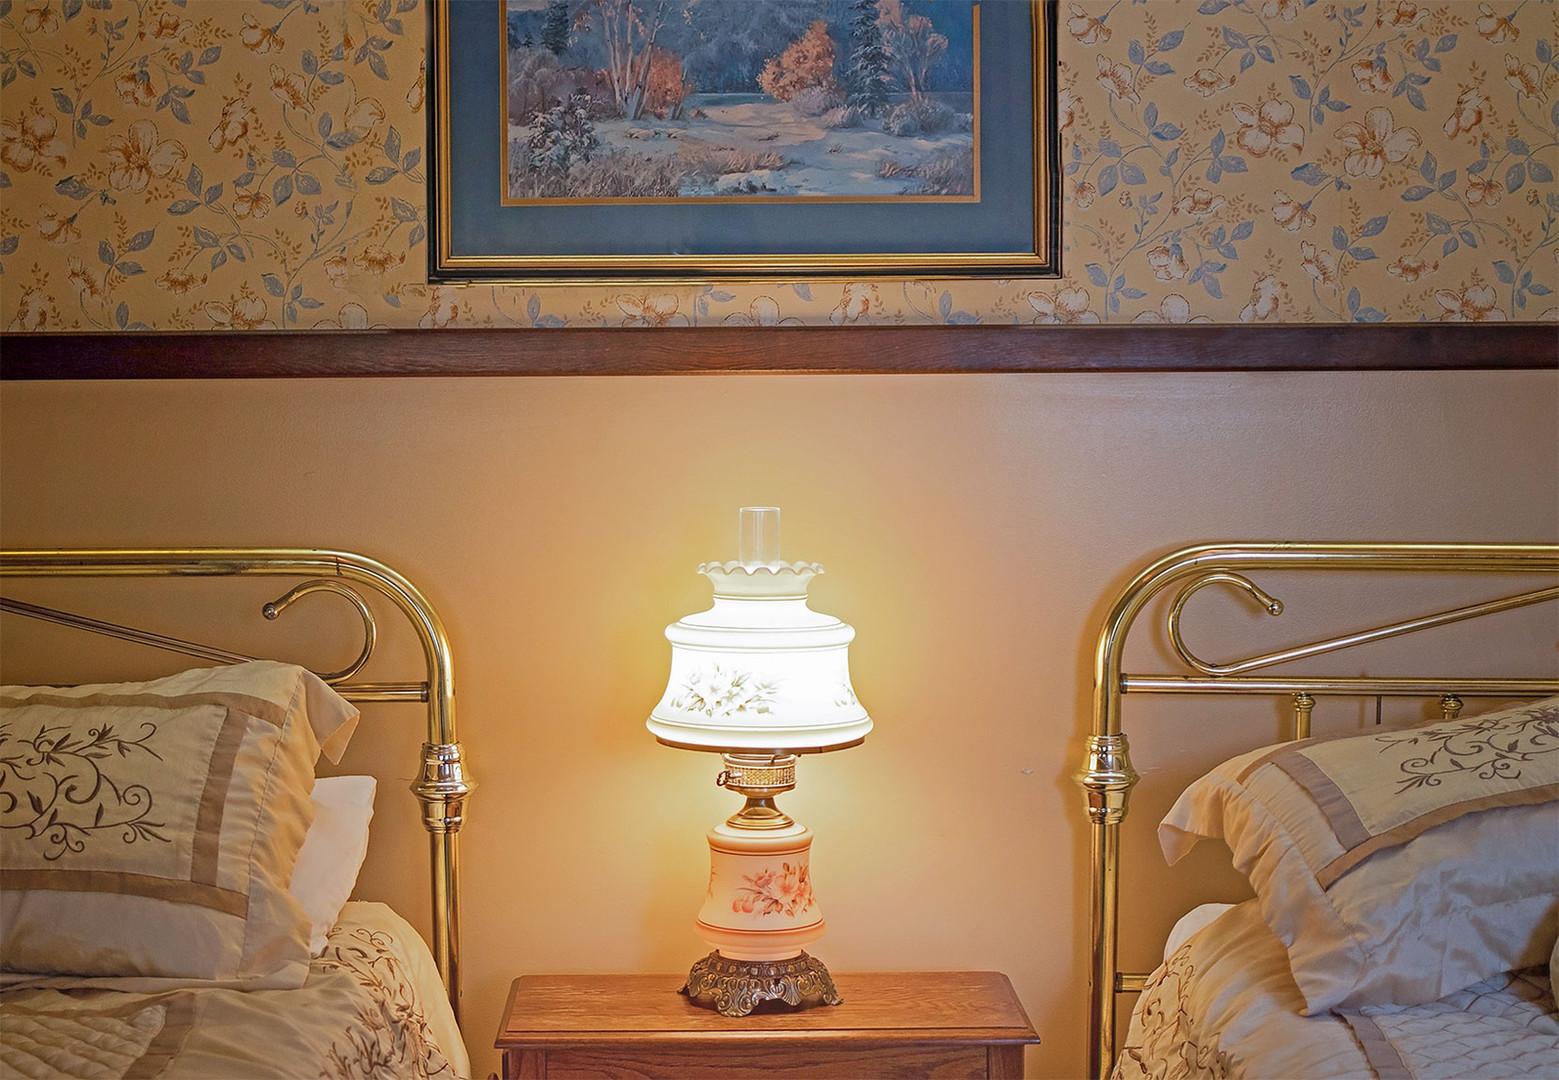 Double_brass_beds_CottageHouse.jpg